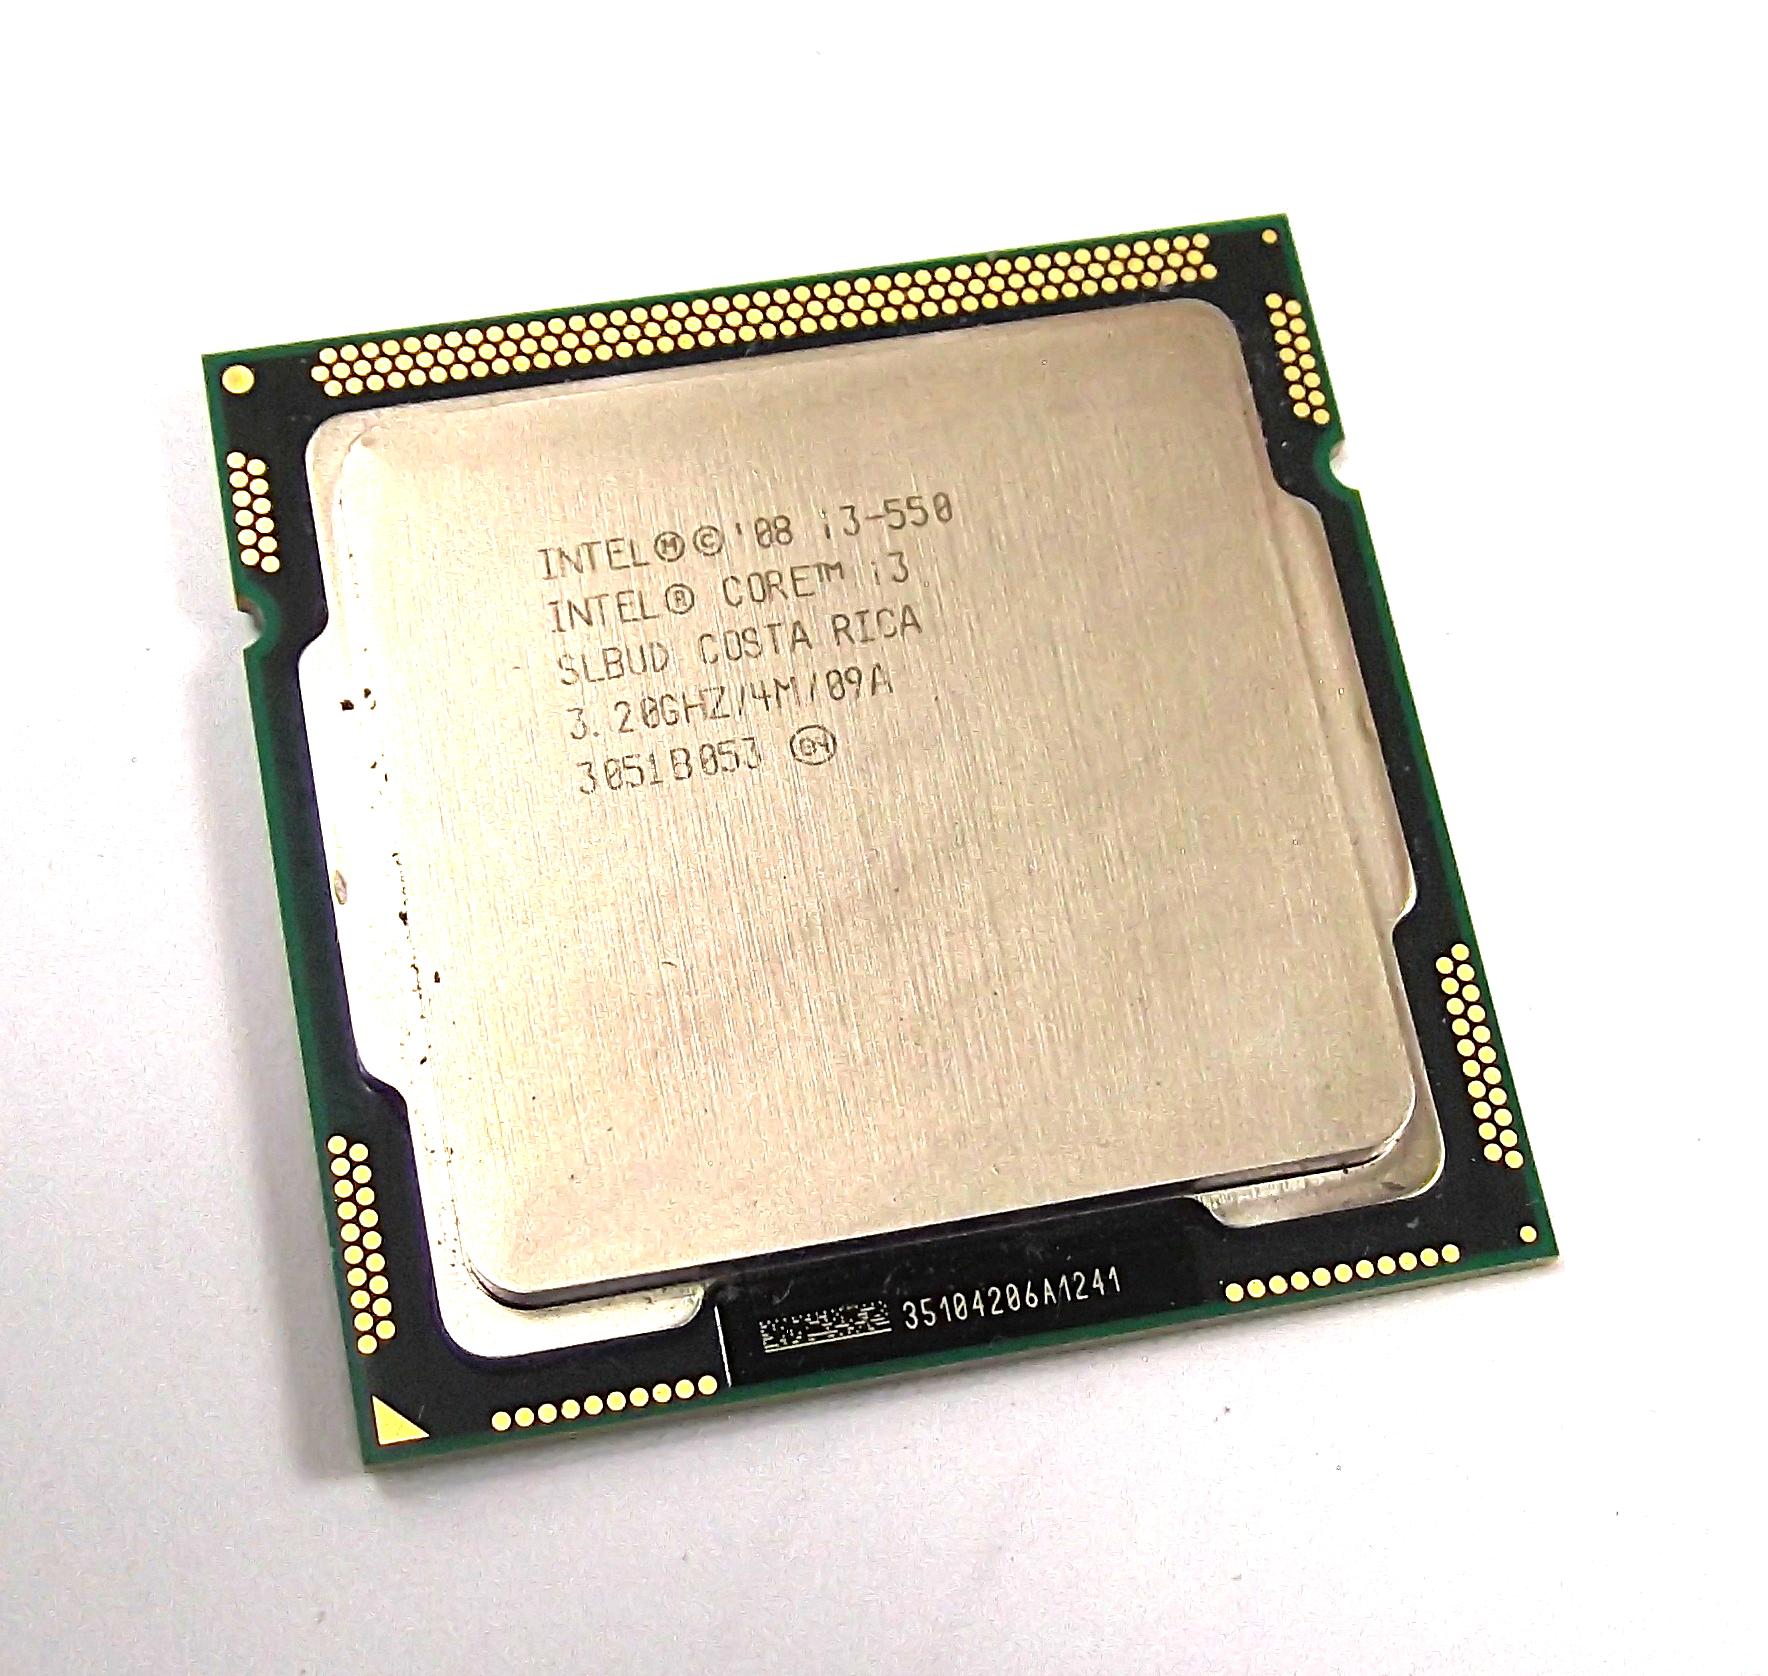 Intel SLBUD Core I3 550 32GHz LGA1156 Dual Core Processor